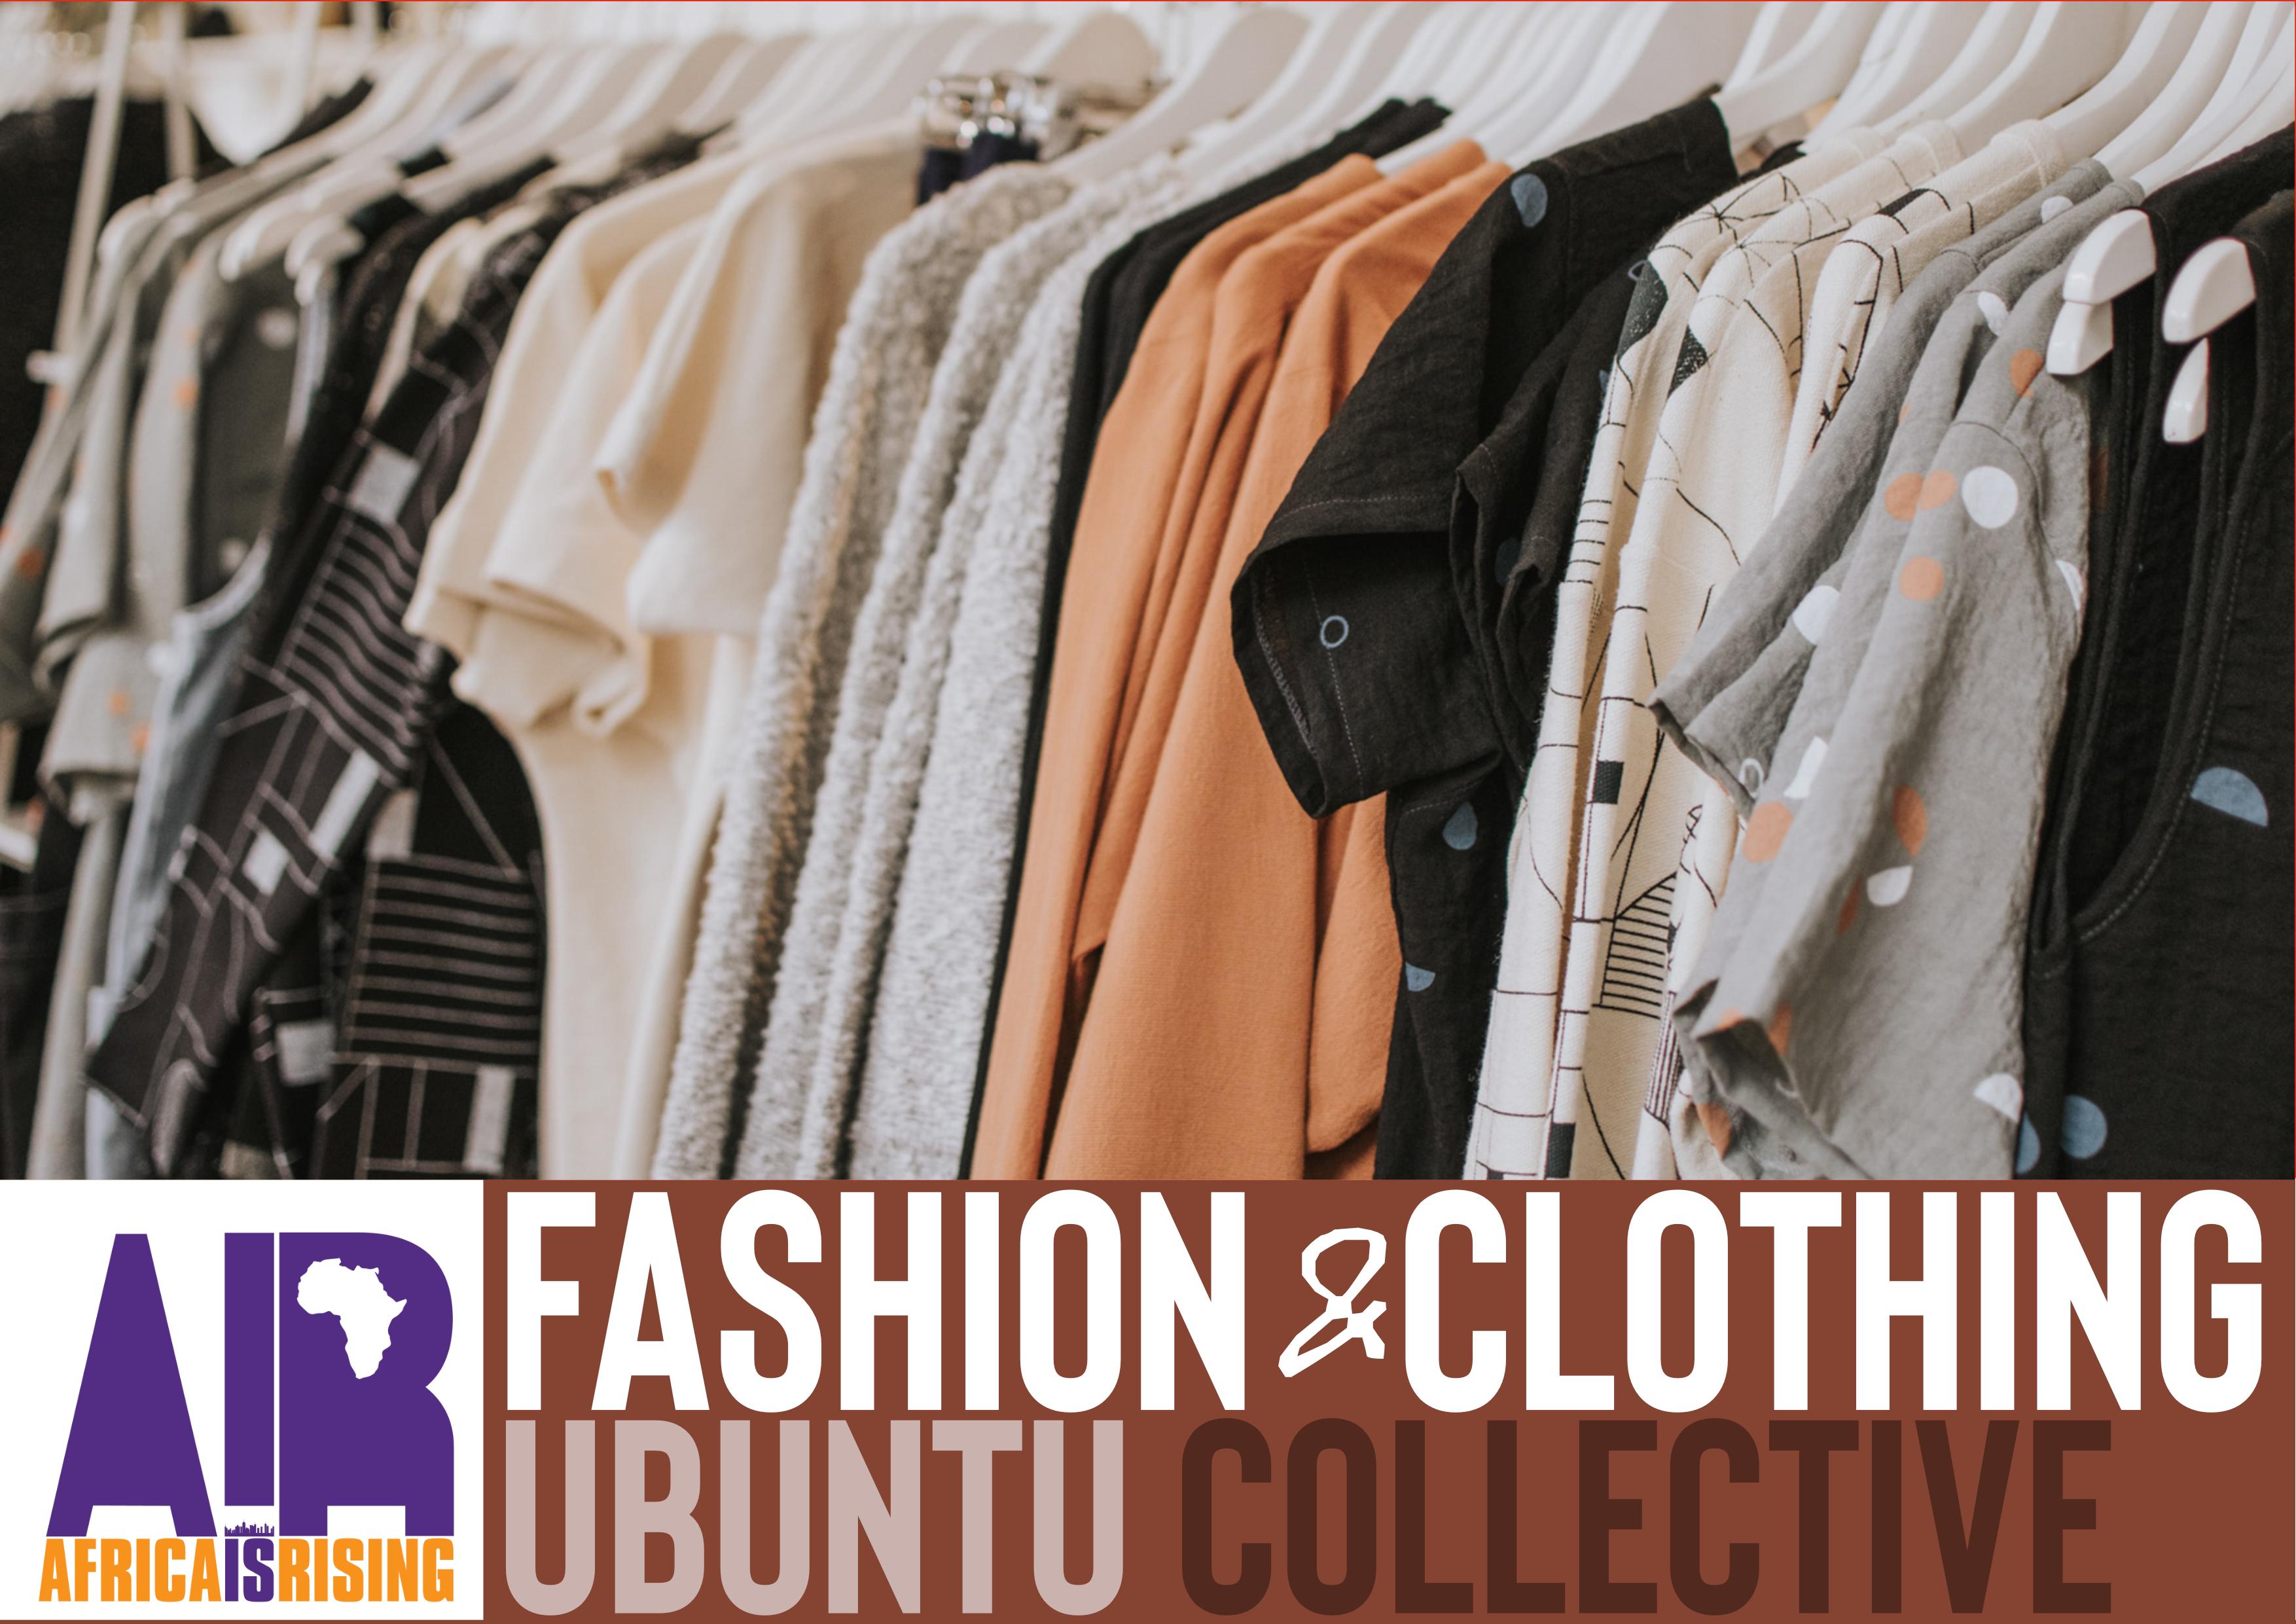 Fashion&Clothing Industry Community